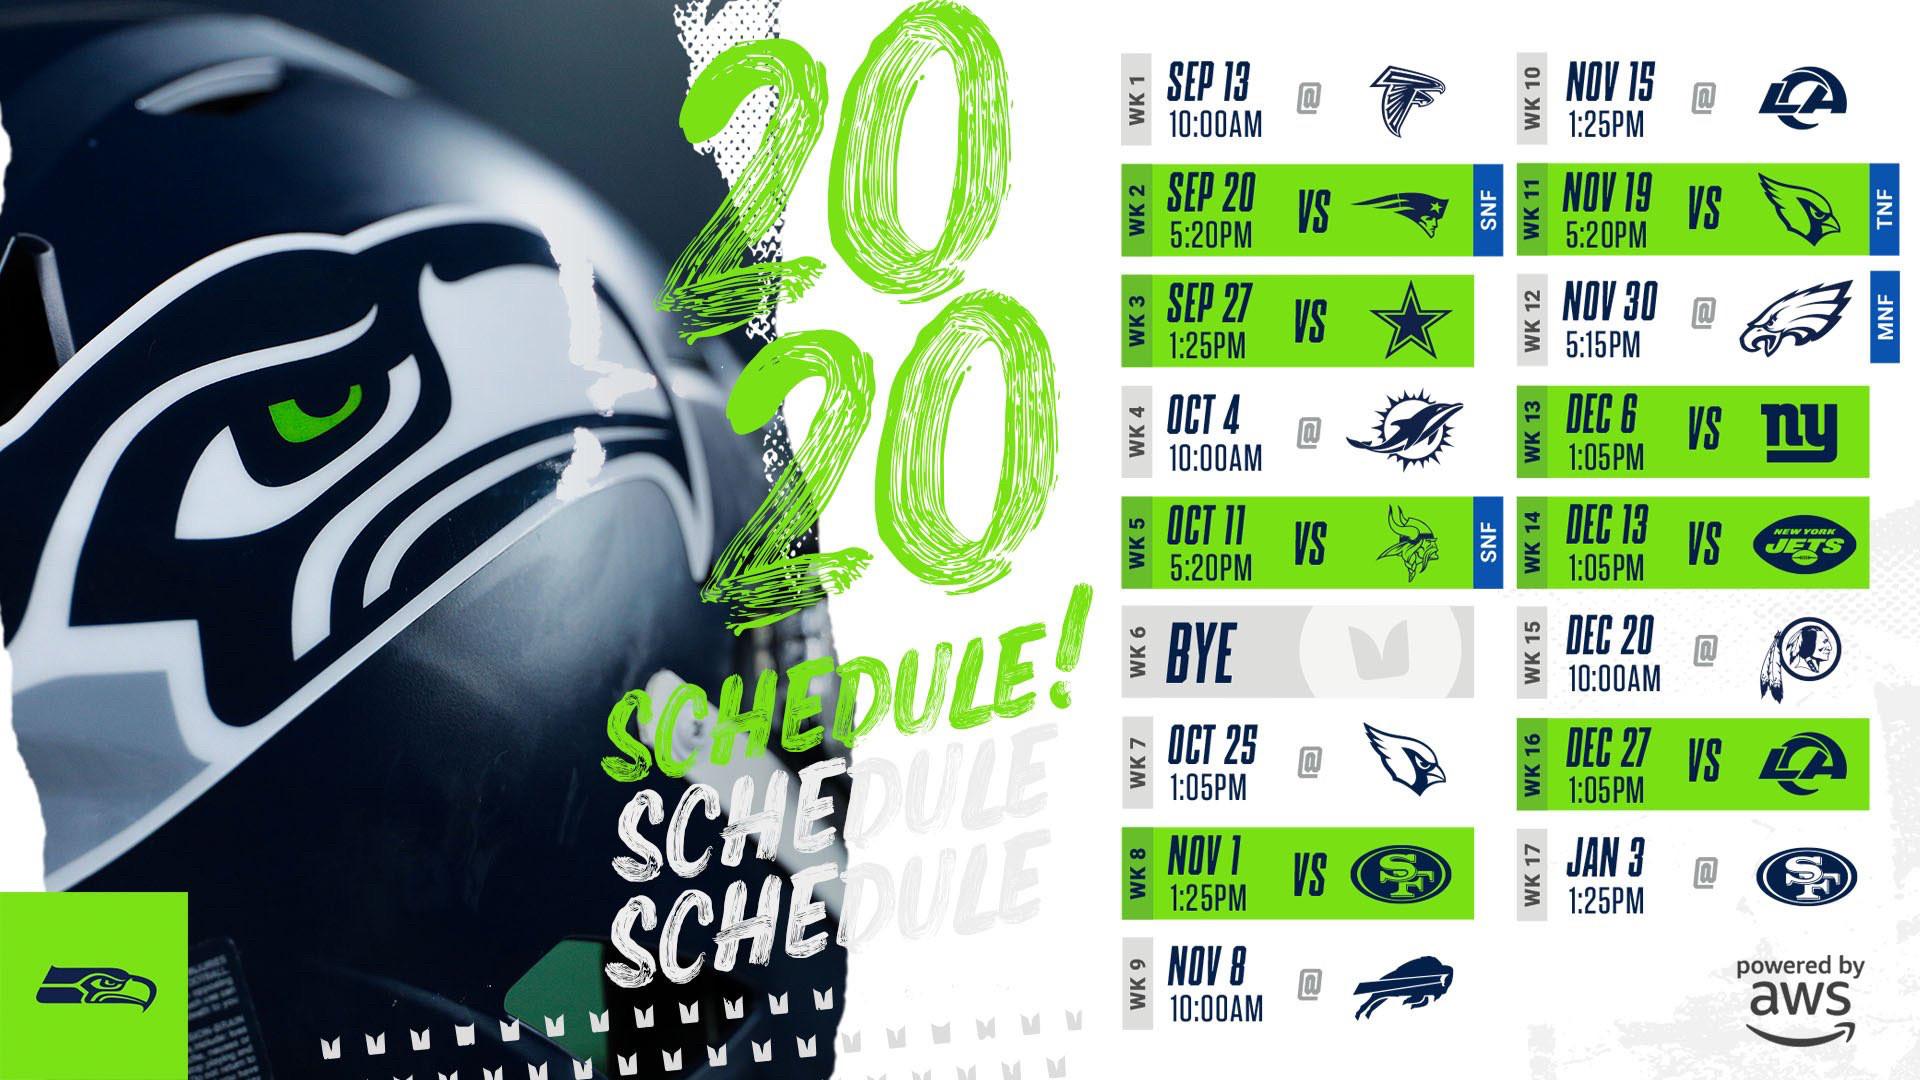 Seahawks 2020 Schedule Wallpaper   Imgur 1920x1080